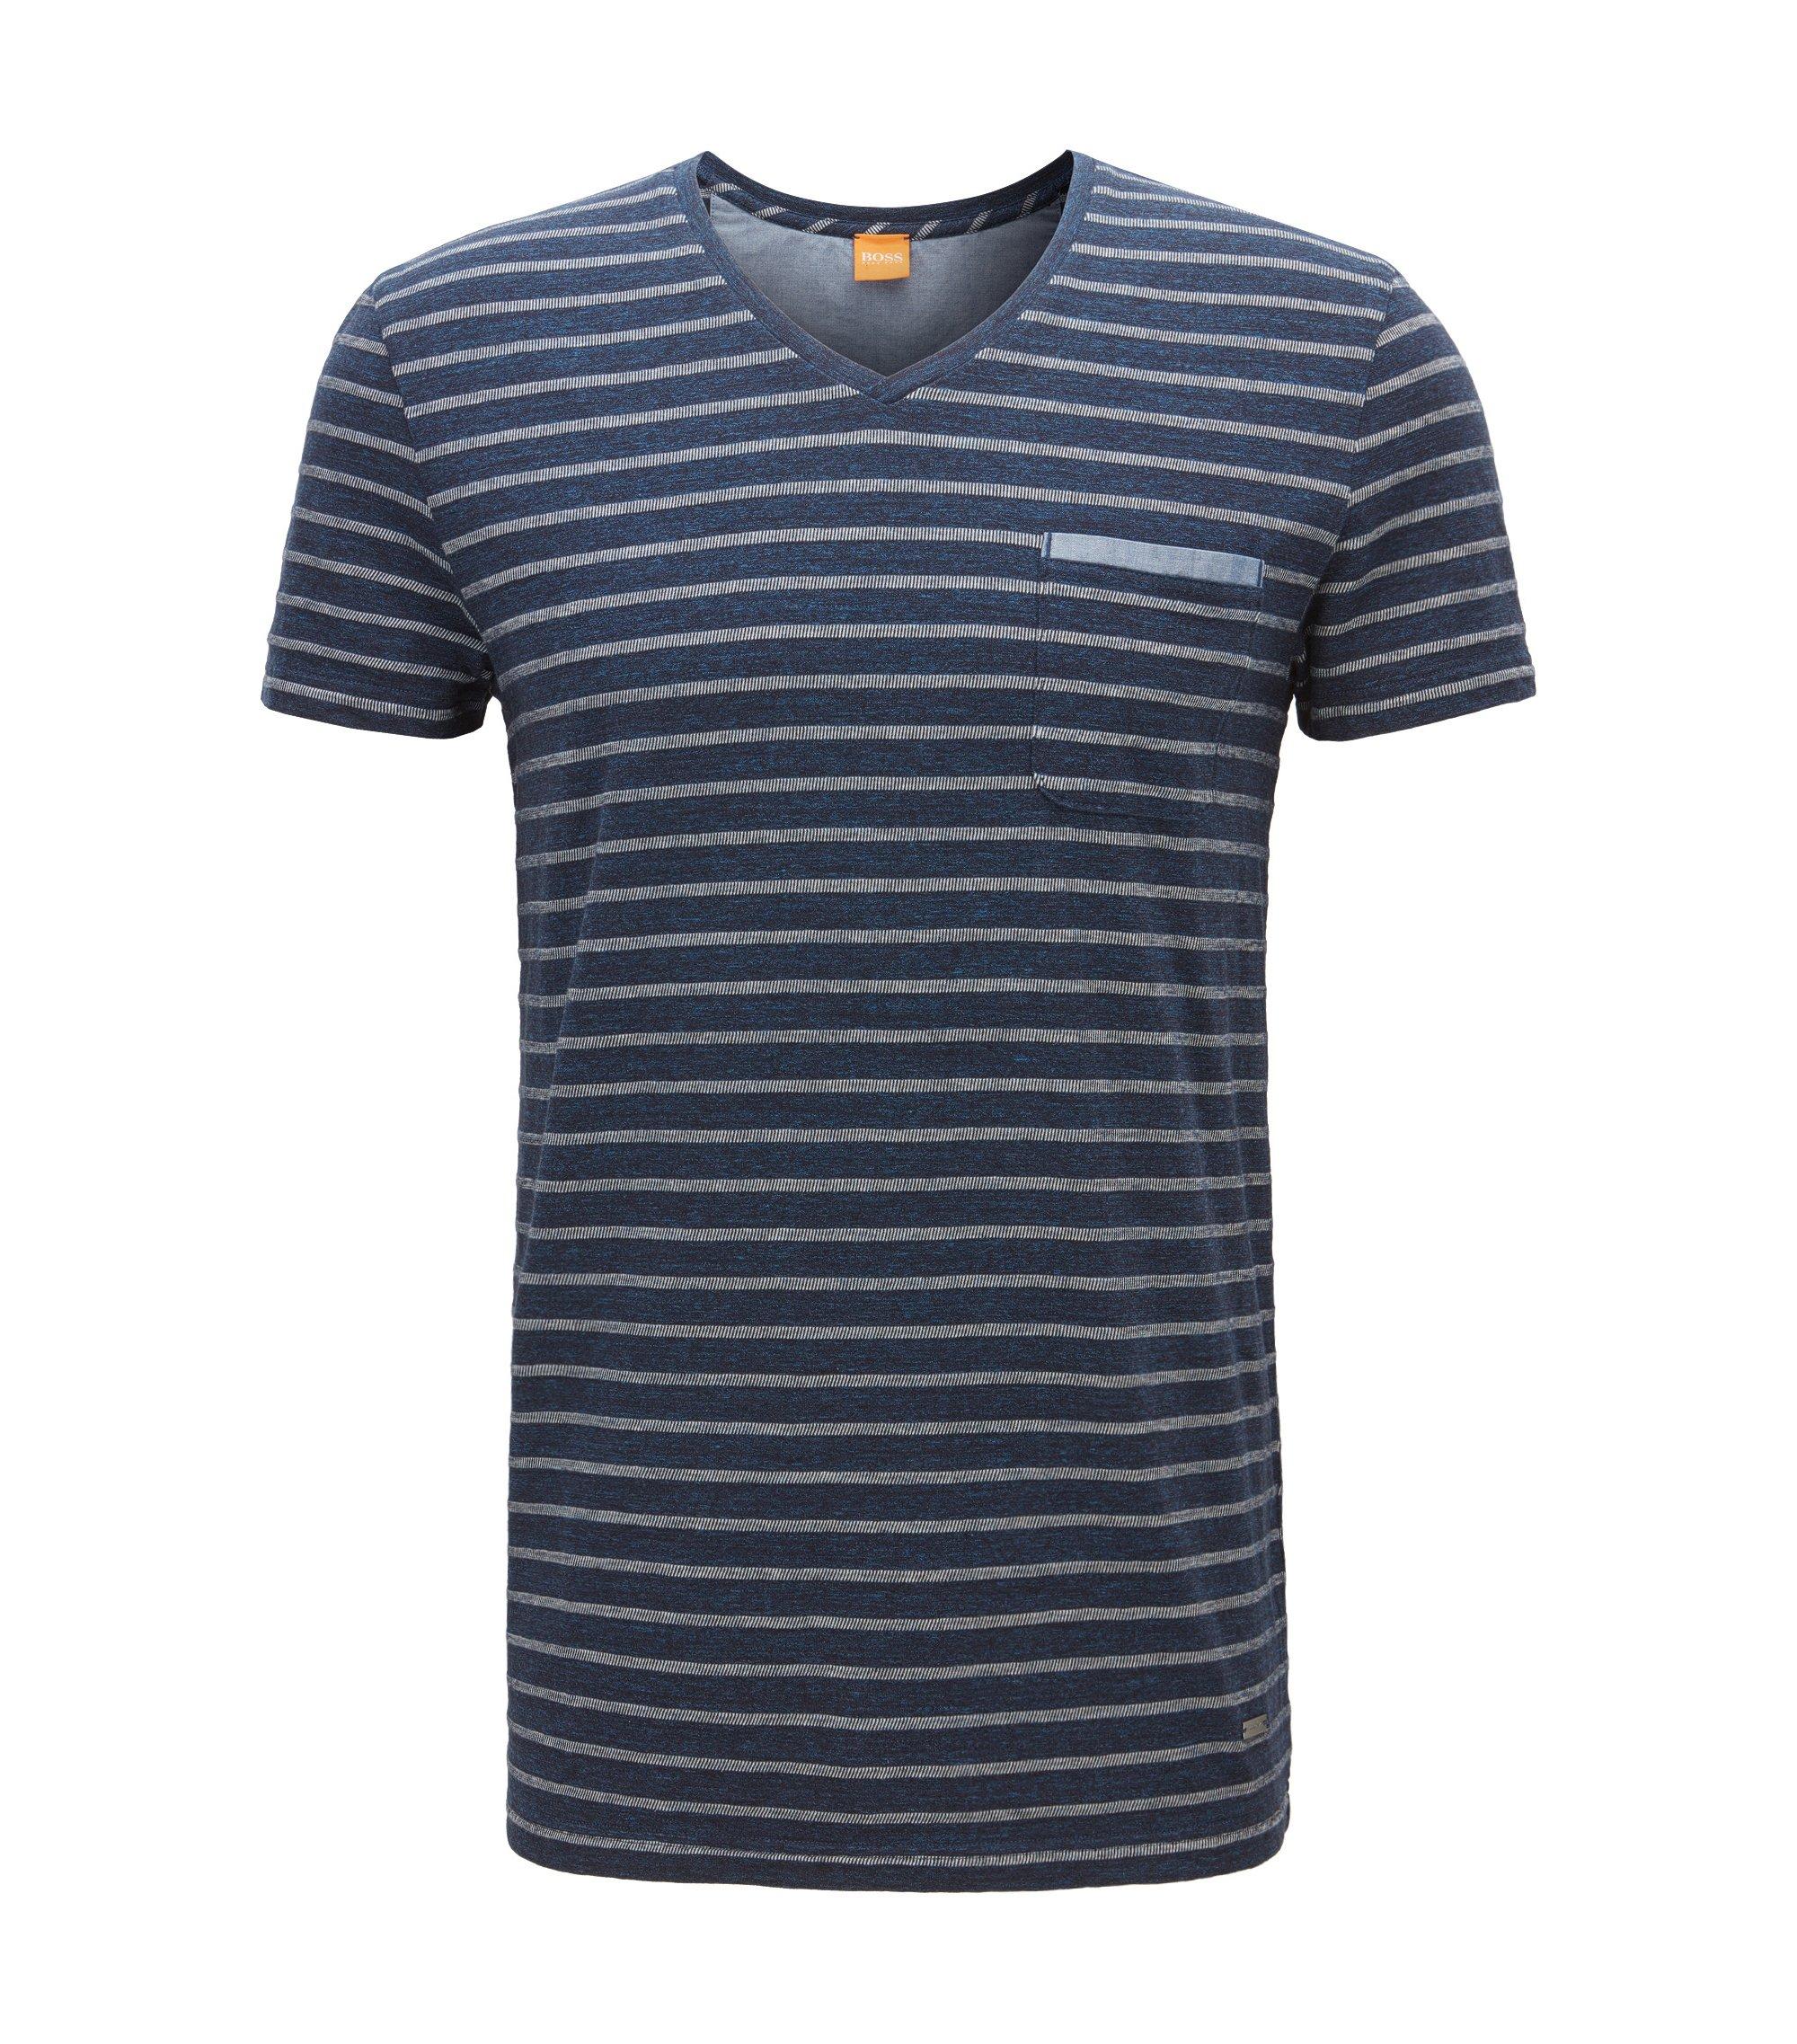 'Tramway' | Striped Cotton Jersey T-Shirt, Dark Blue